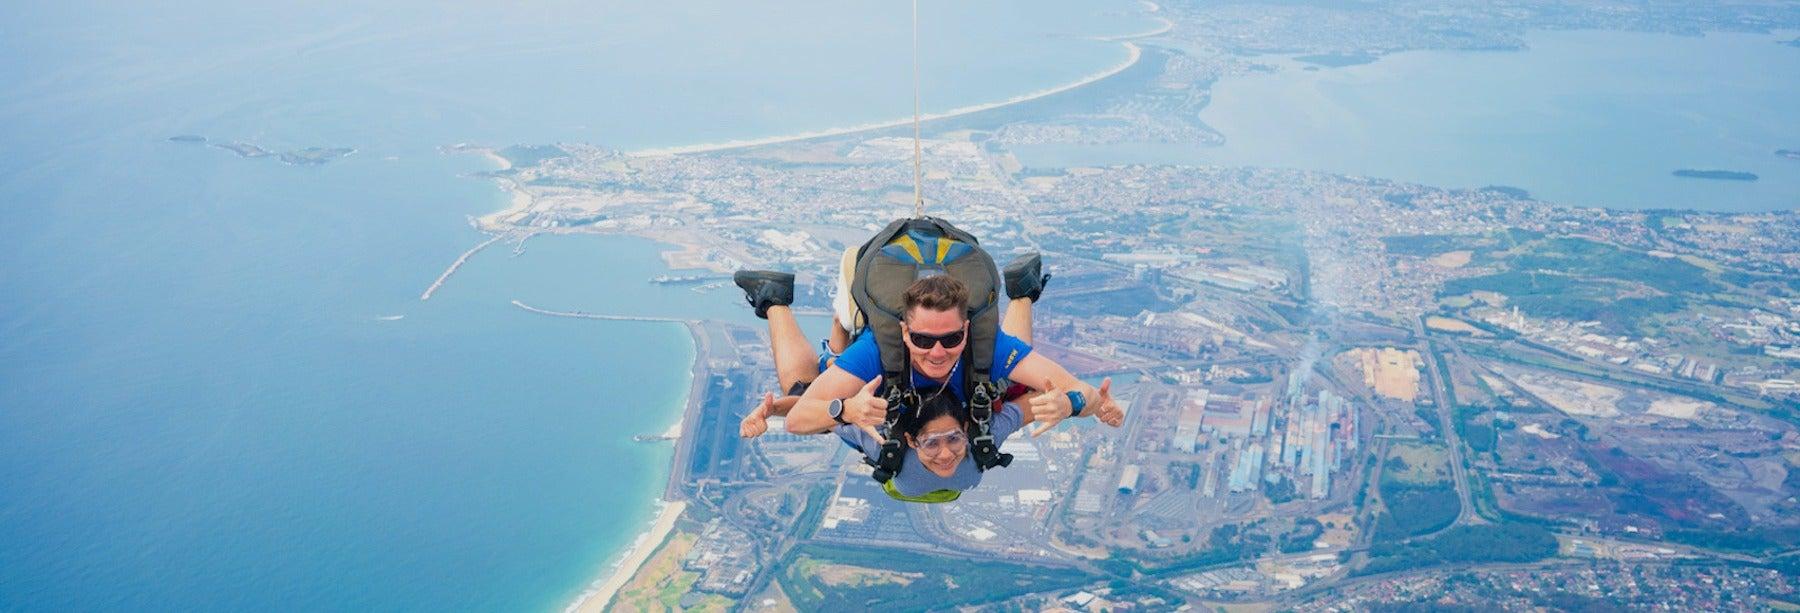 Salto en paracaídas en Sídney